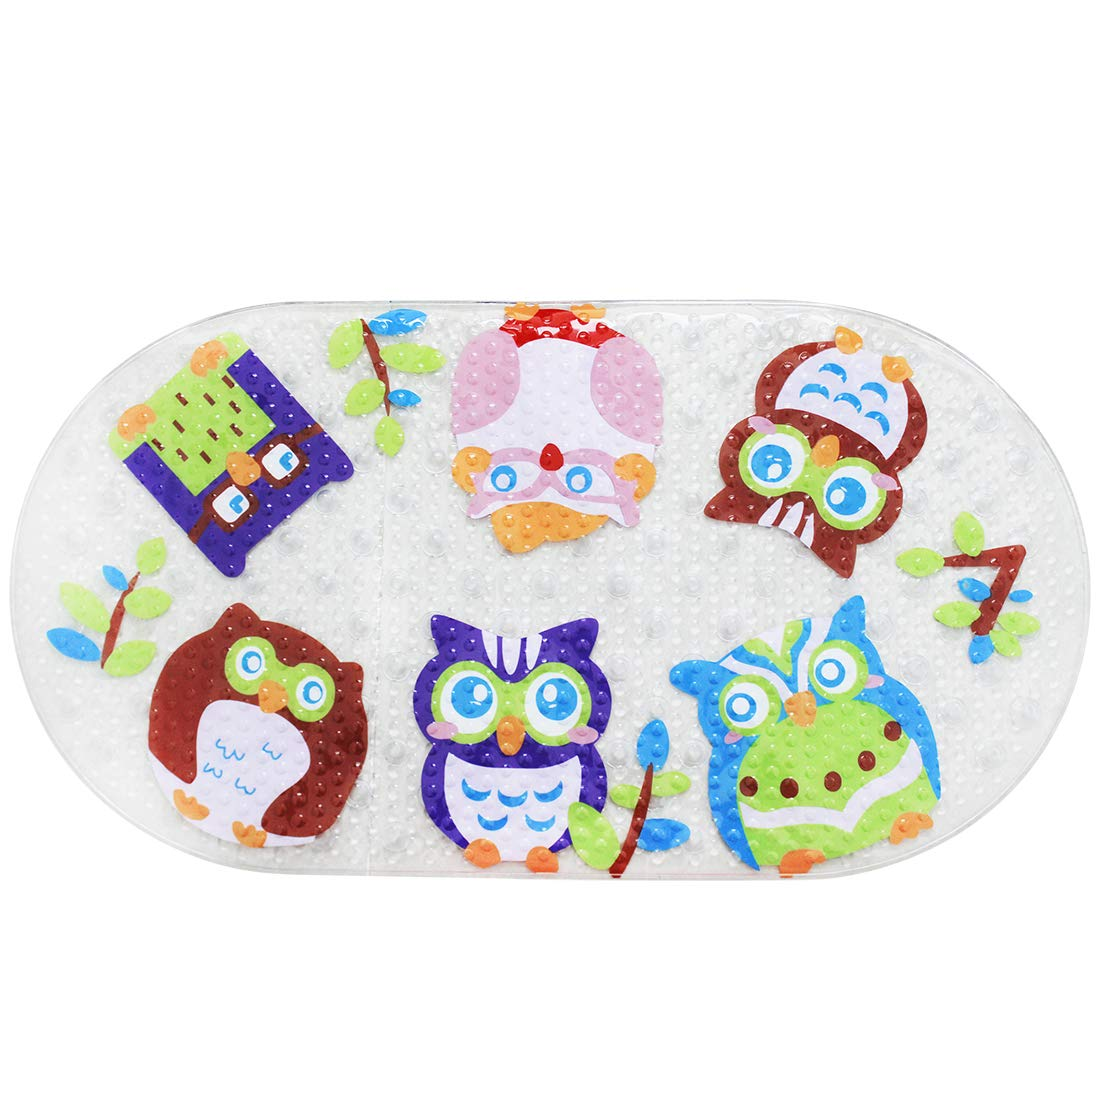 Ainko Kids No-Slip Bath Mat for Tub Baby Anti-Slip Shower Mat,Cool Slip Resistant Bathroom Floor Bathtub Mats